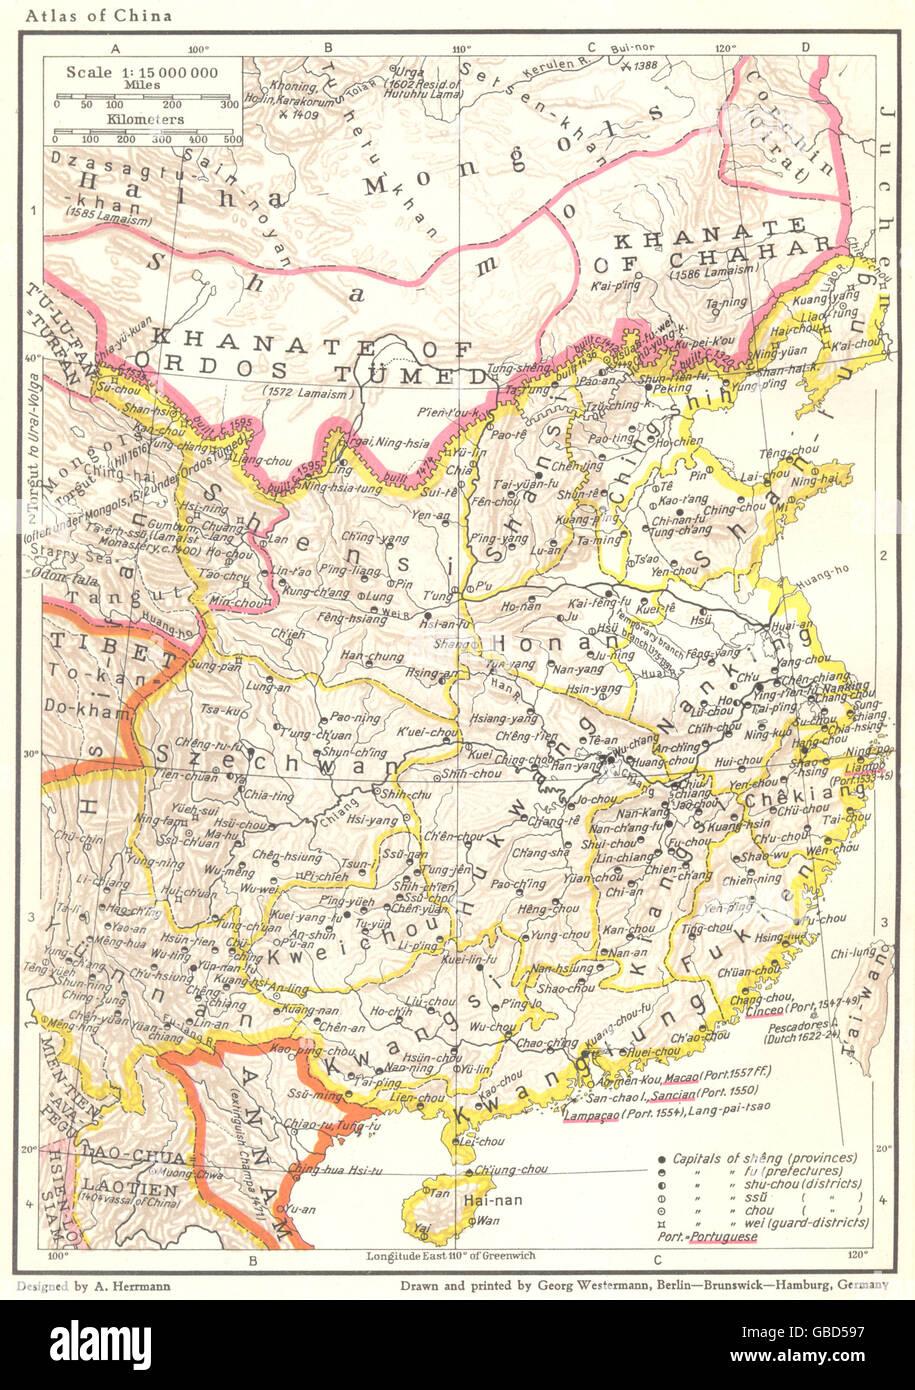 Carte Chine Ming.Chine La Dynastie Ming 1368 1644 Ad Frontieres De 1580 Ad